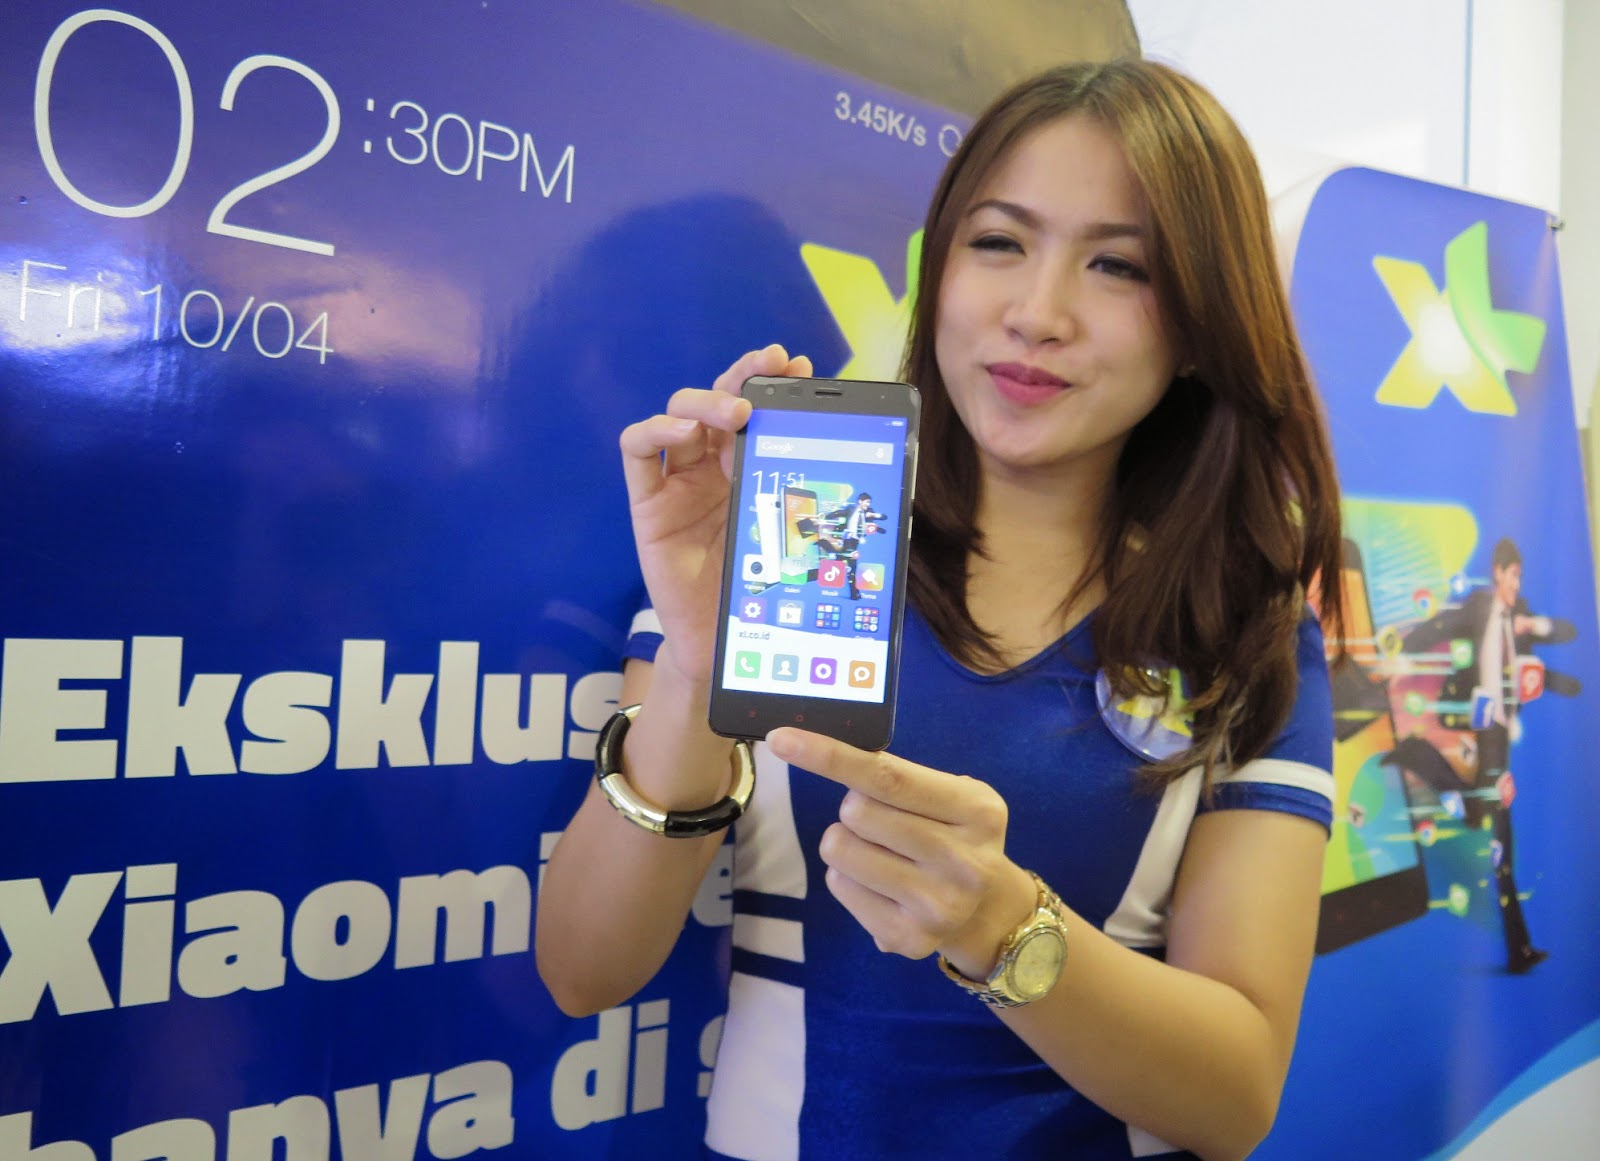 XL Gandeng Xiaomi Luncurkan Bundling Smartphone Redmi 2